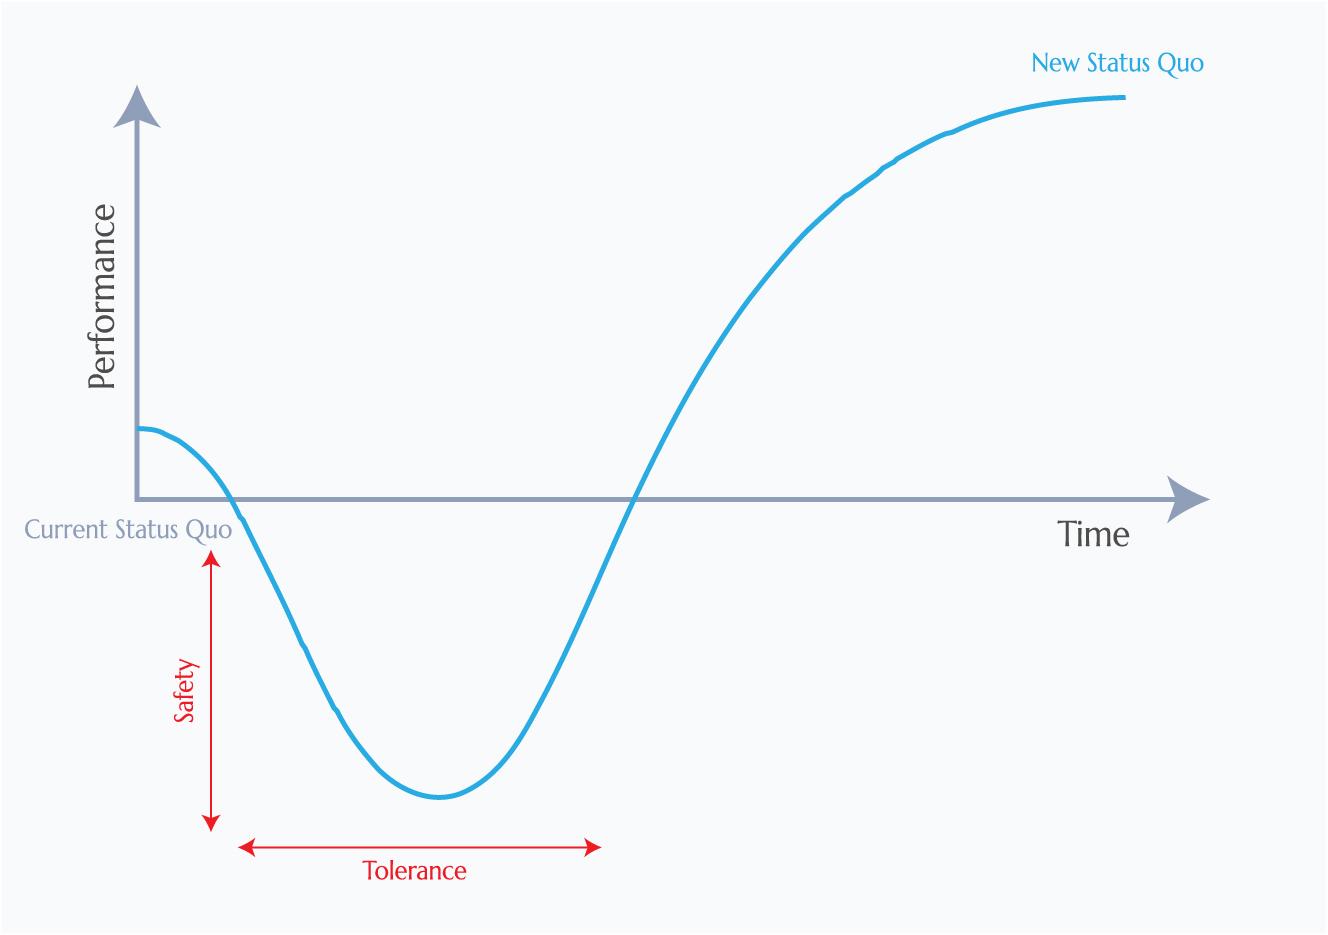 J curve effect - revolutionary change - patience, safety